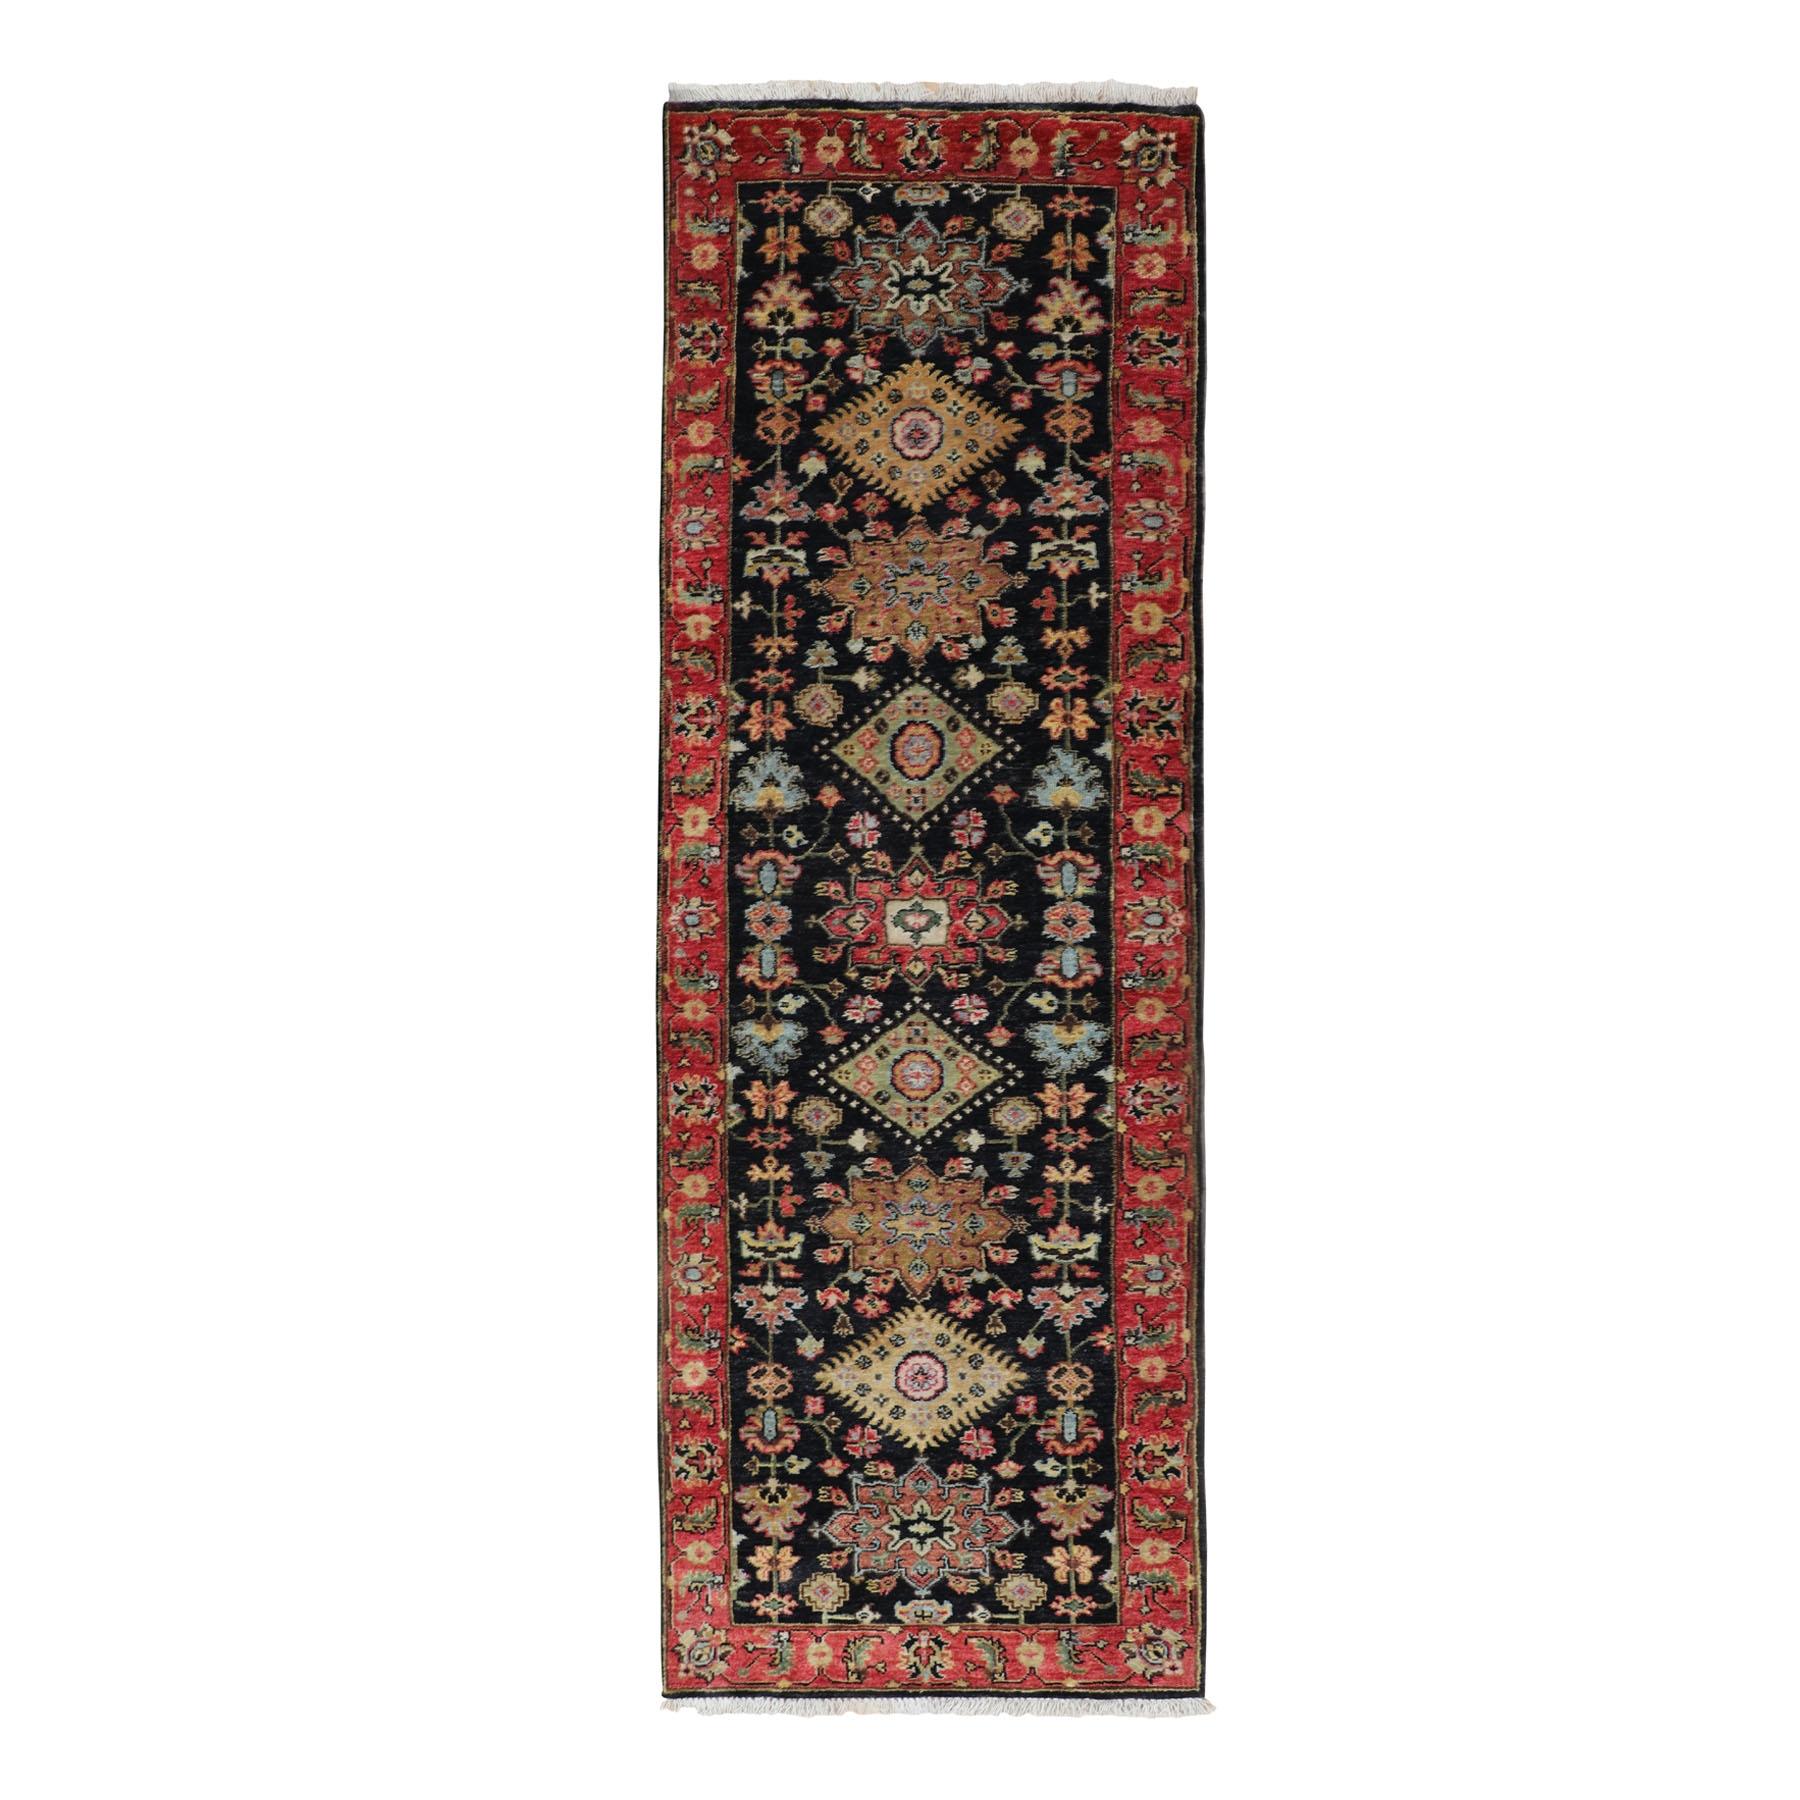 "2'7""x8' Black Karajeh Design Runner Hand Knotted Pure Wool Oriental Rug"